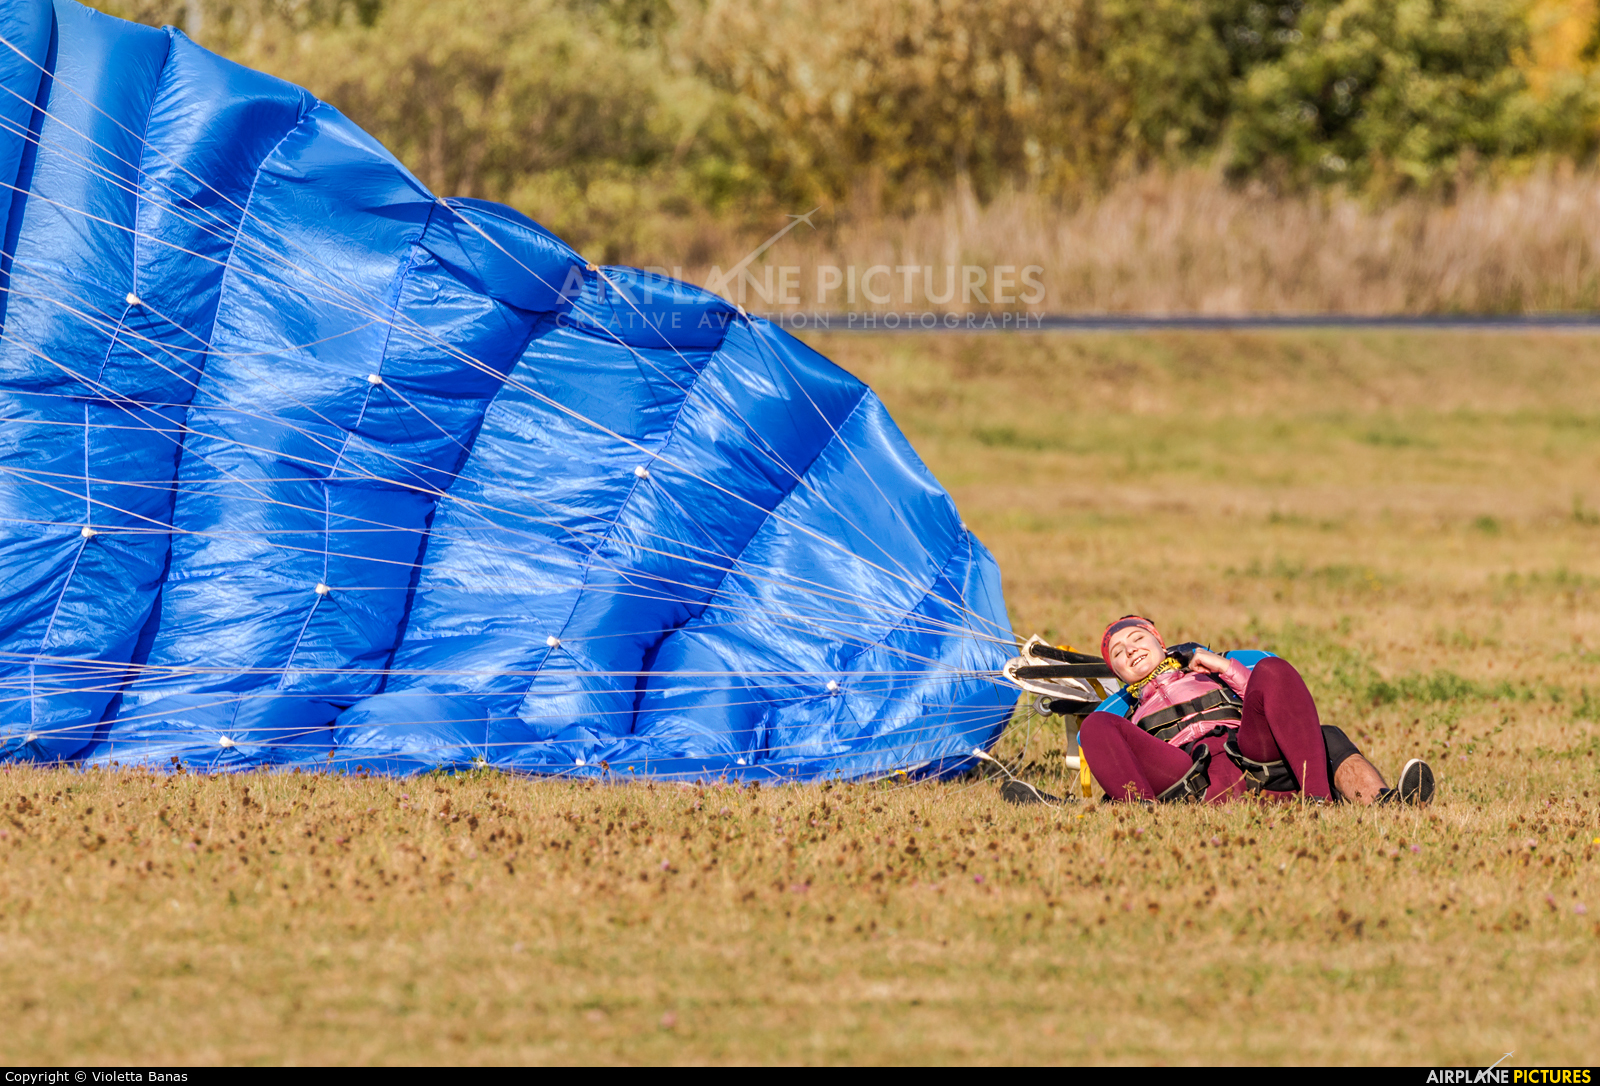 Parachute - aircraft at Inowrocław